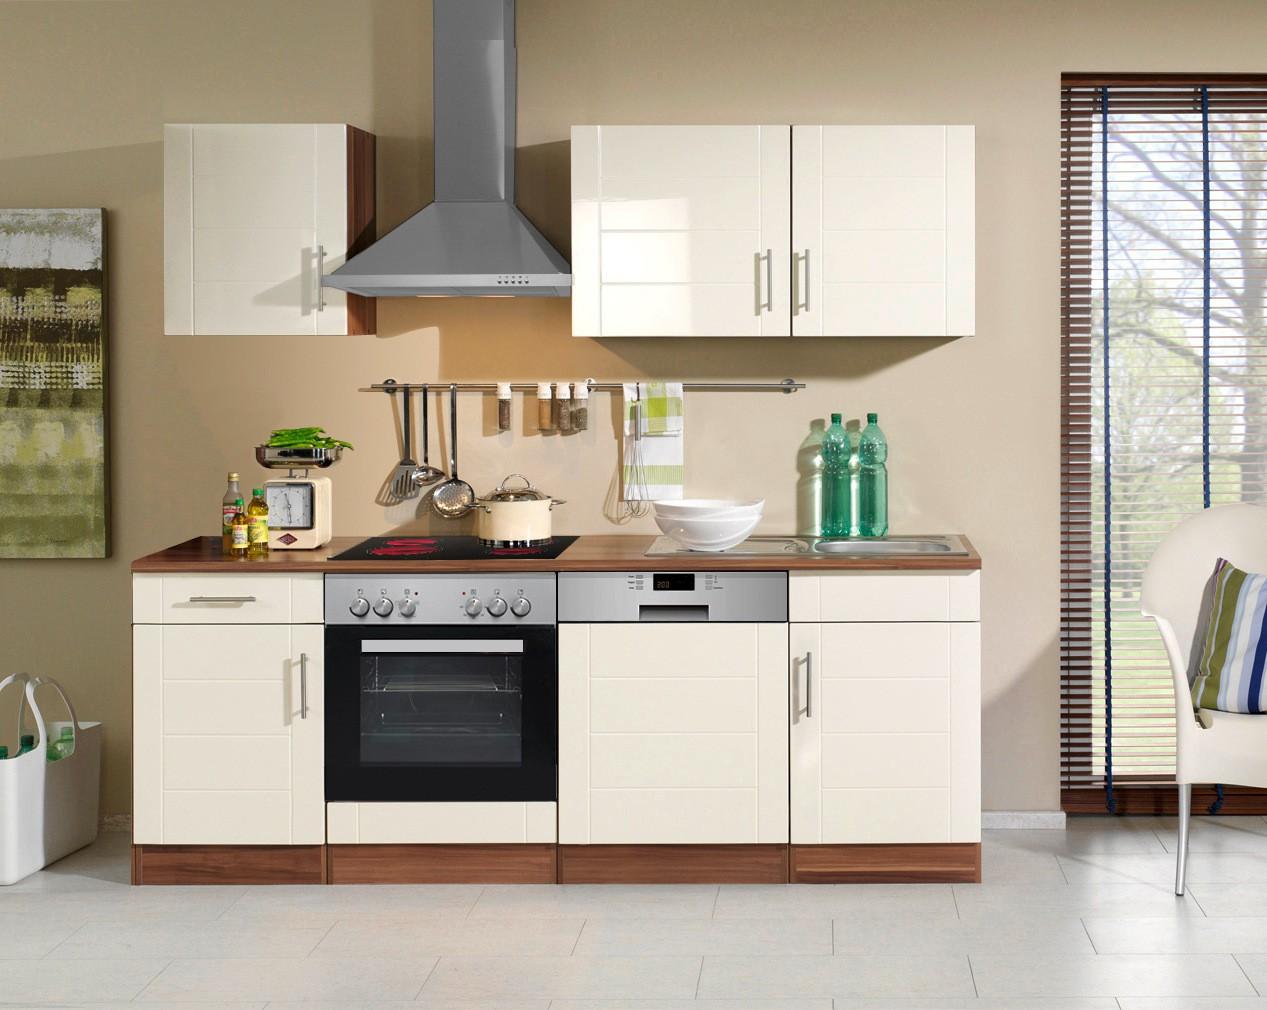 Full Size of Küche Mit Elektrogeräten 240 Cm Küche Mit Elektrogeräten Billig Küche Mit Elektrogeräten Günstig Kaufen Küche Mit Elektrogeräten Hochglanz Küche Eckküche Mit Elektrogeräten